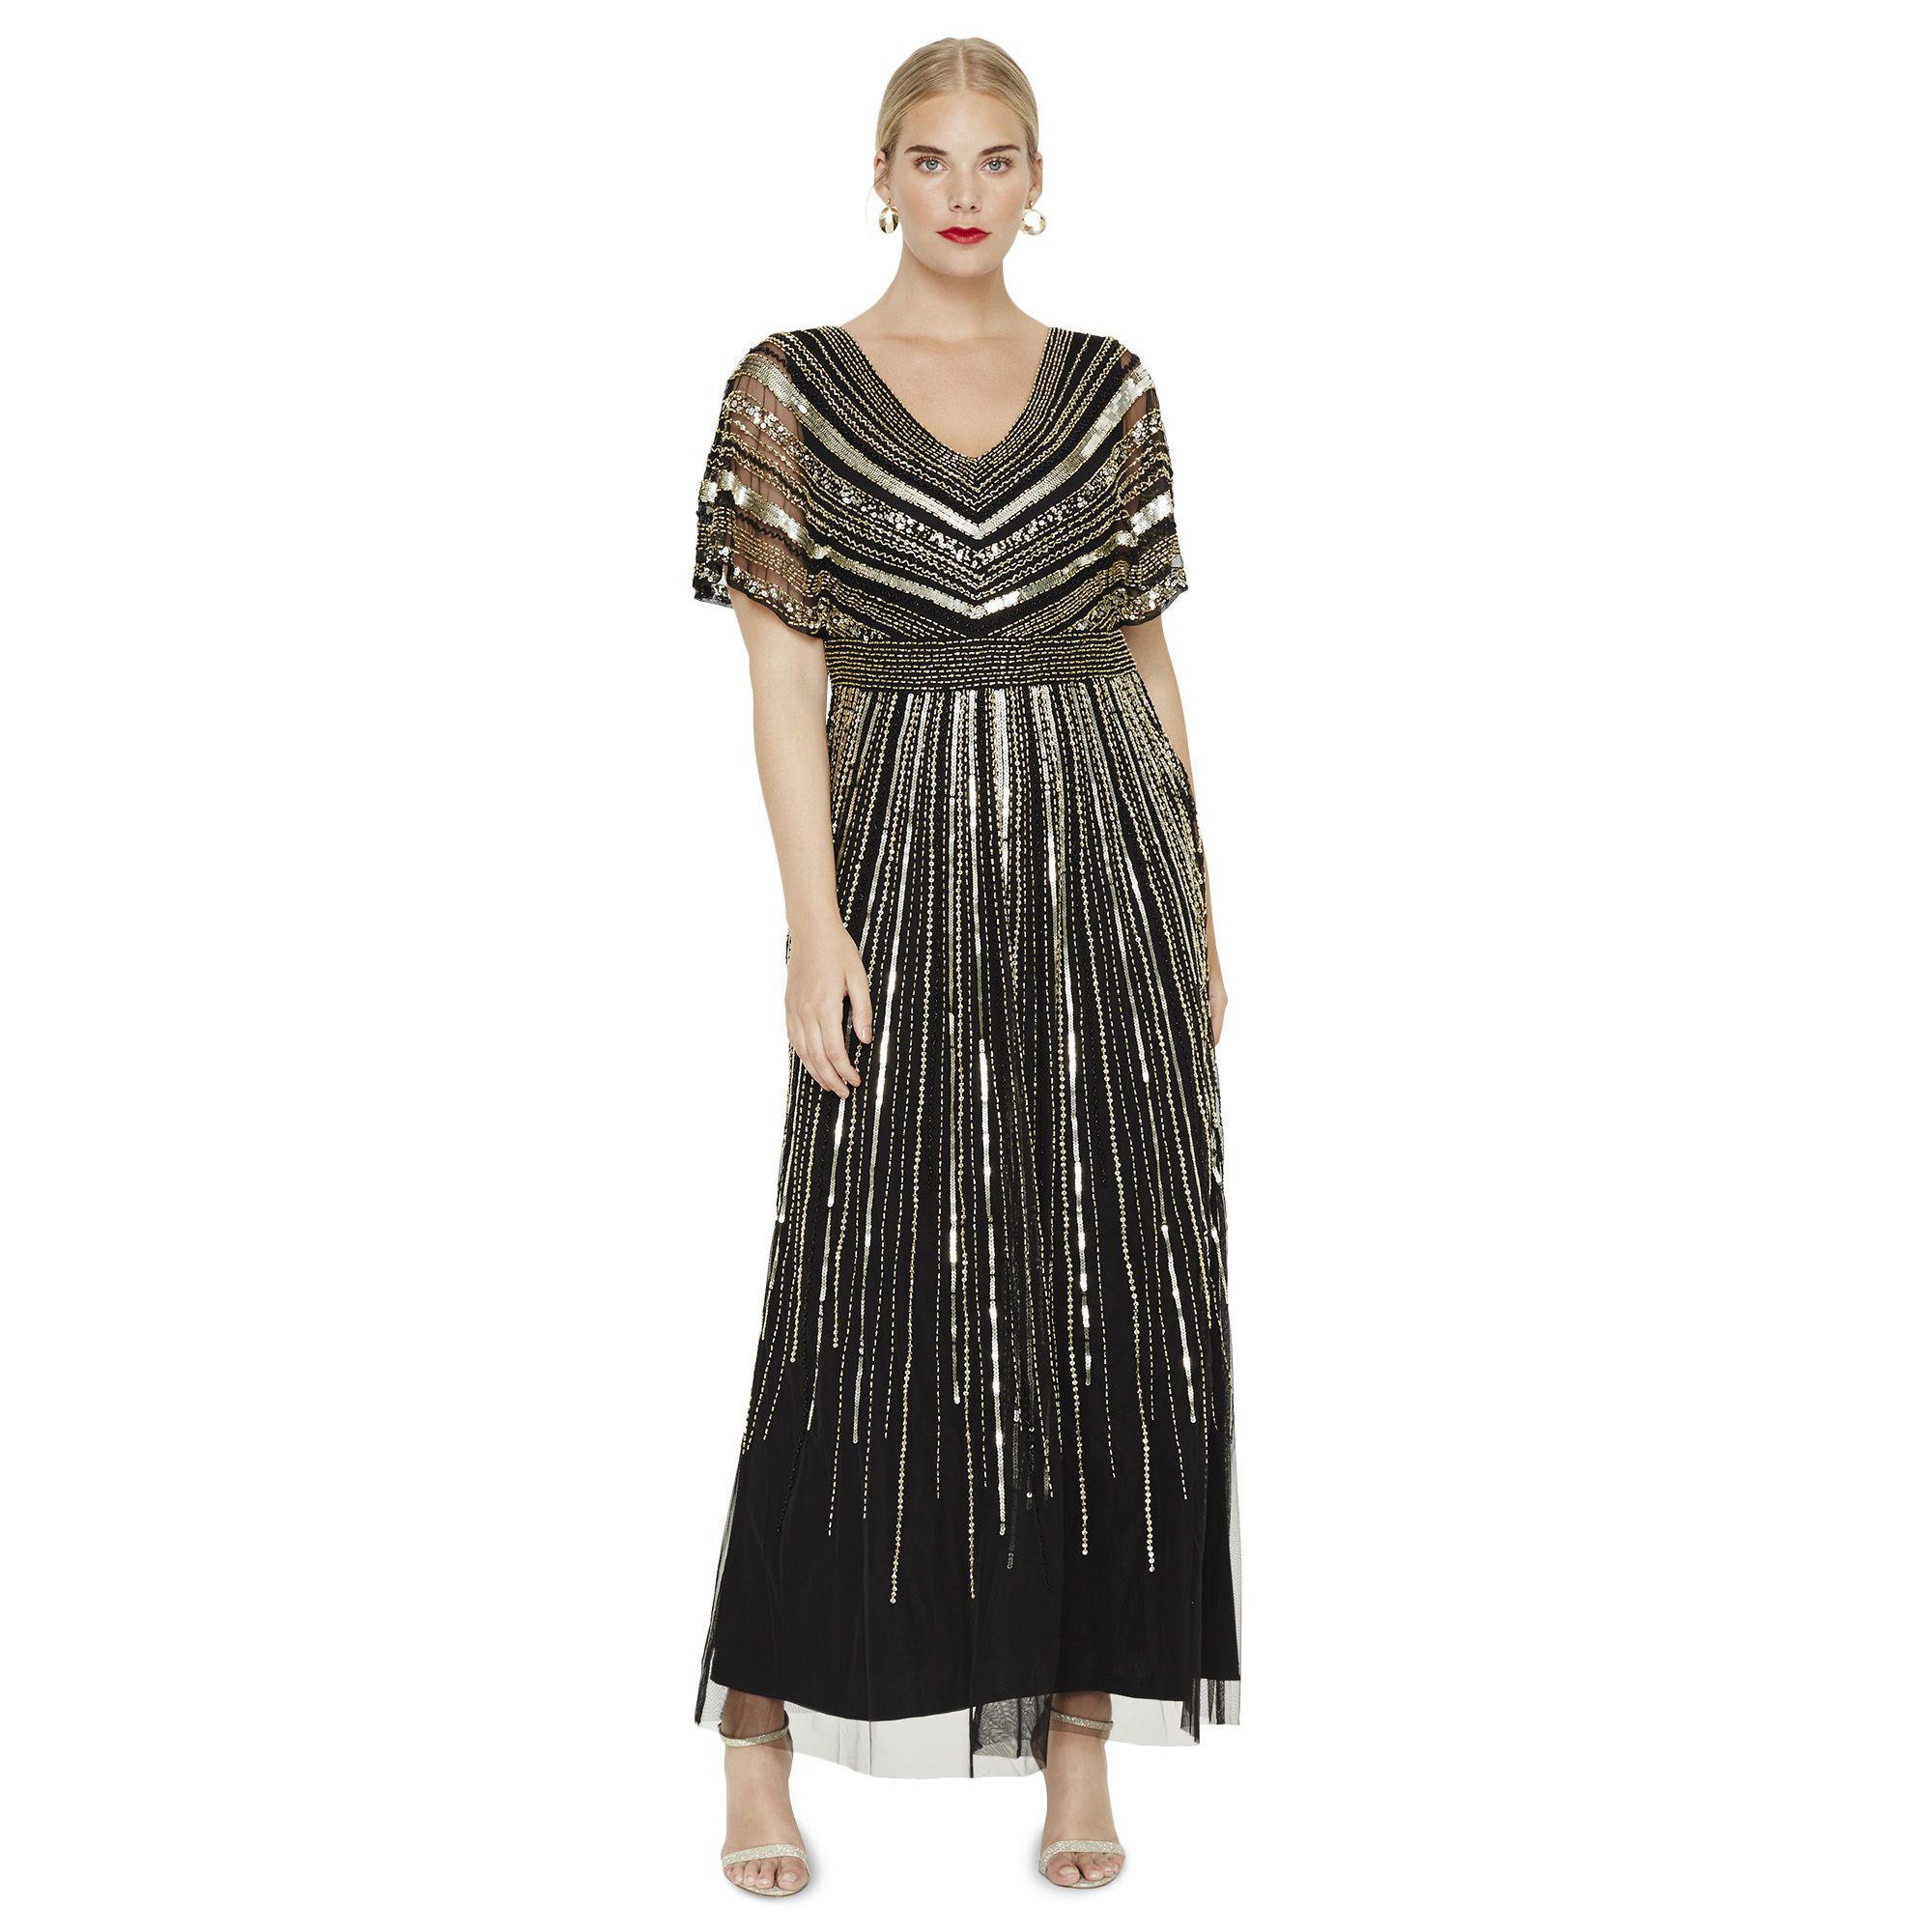 34eee66223e Studio 8 Avalon Beaded Maxi Dress in Black - Lyst